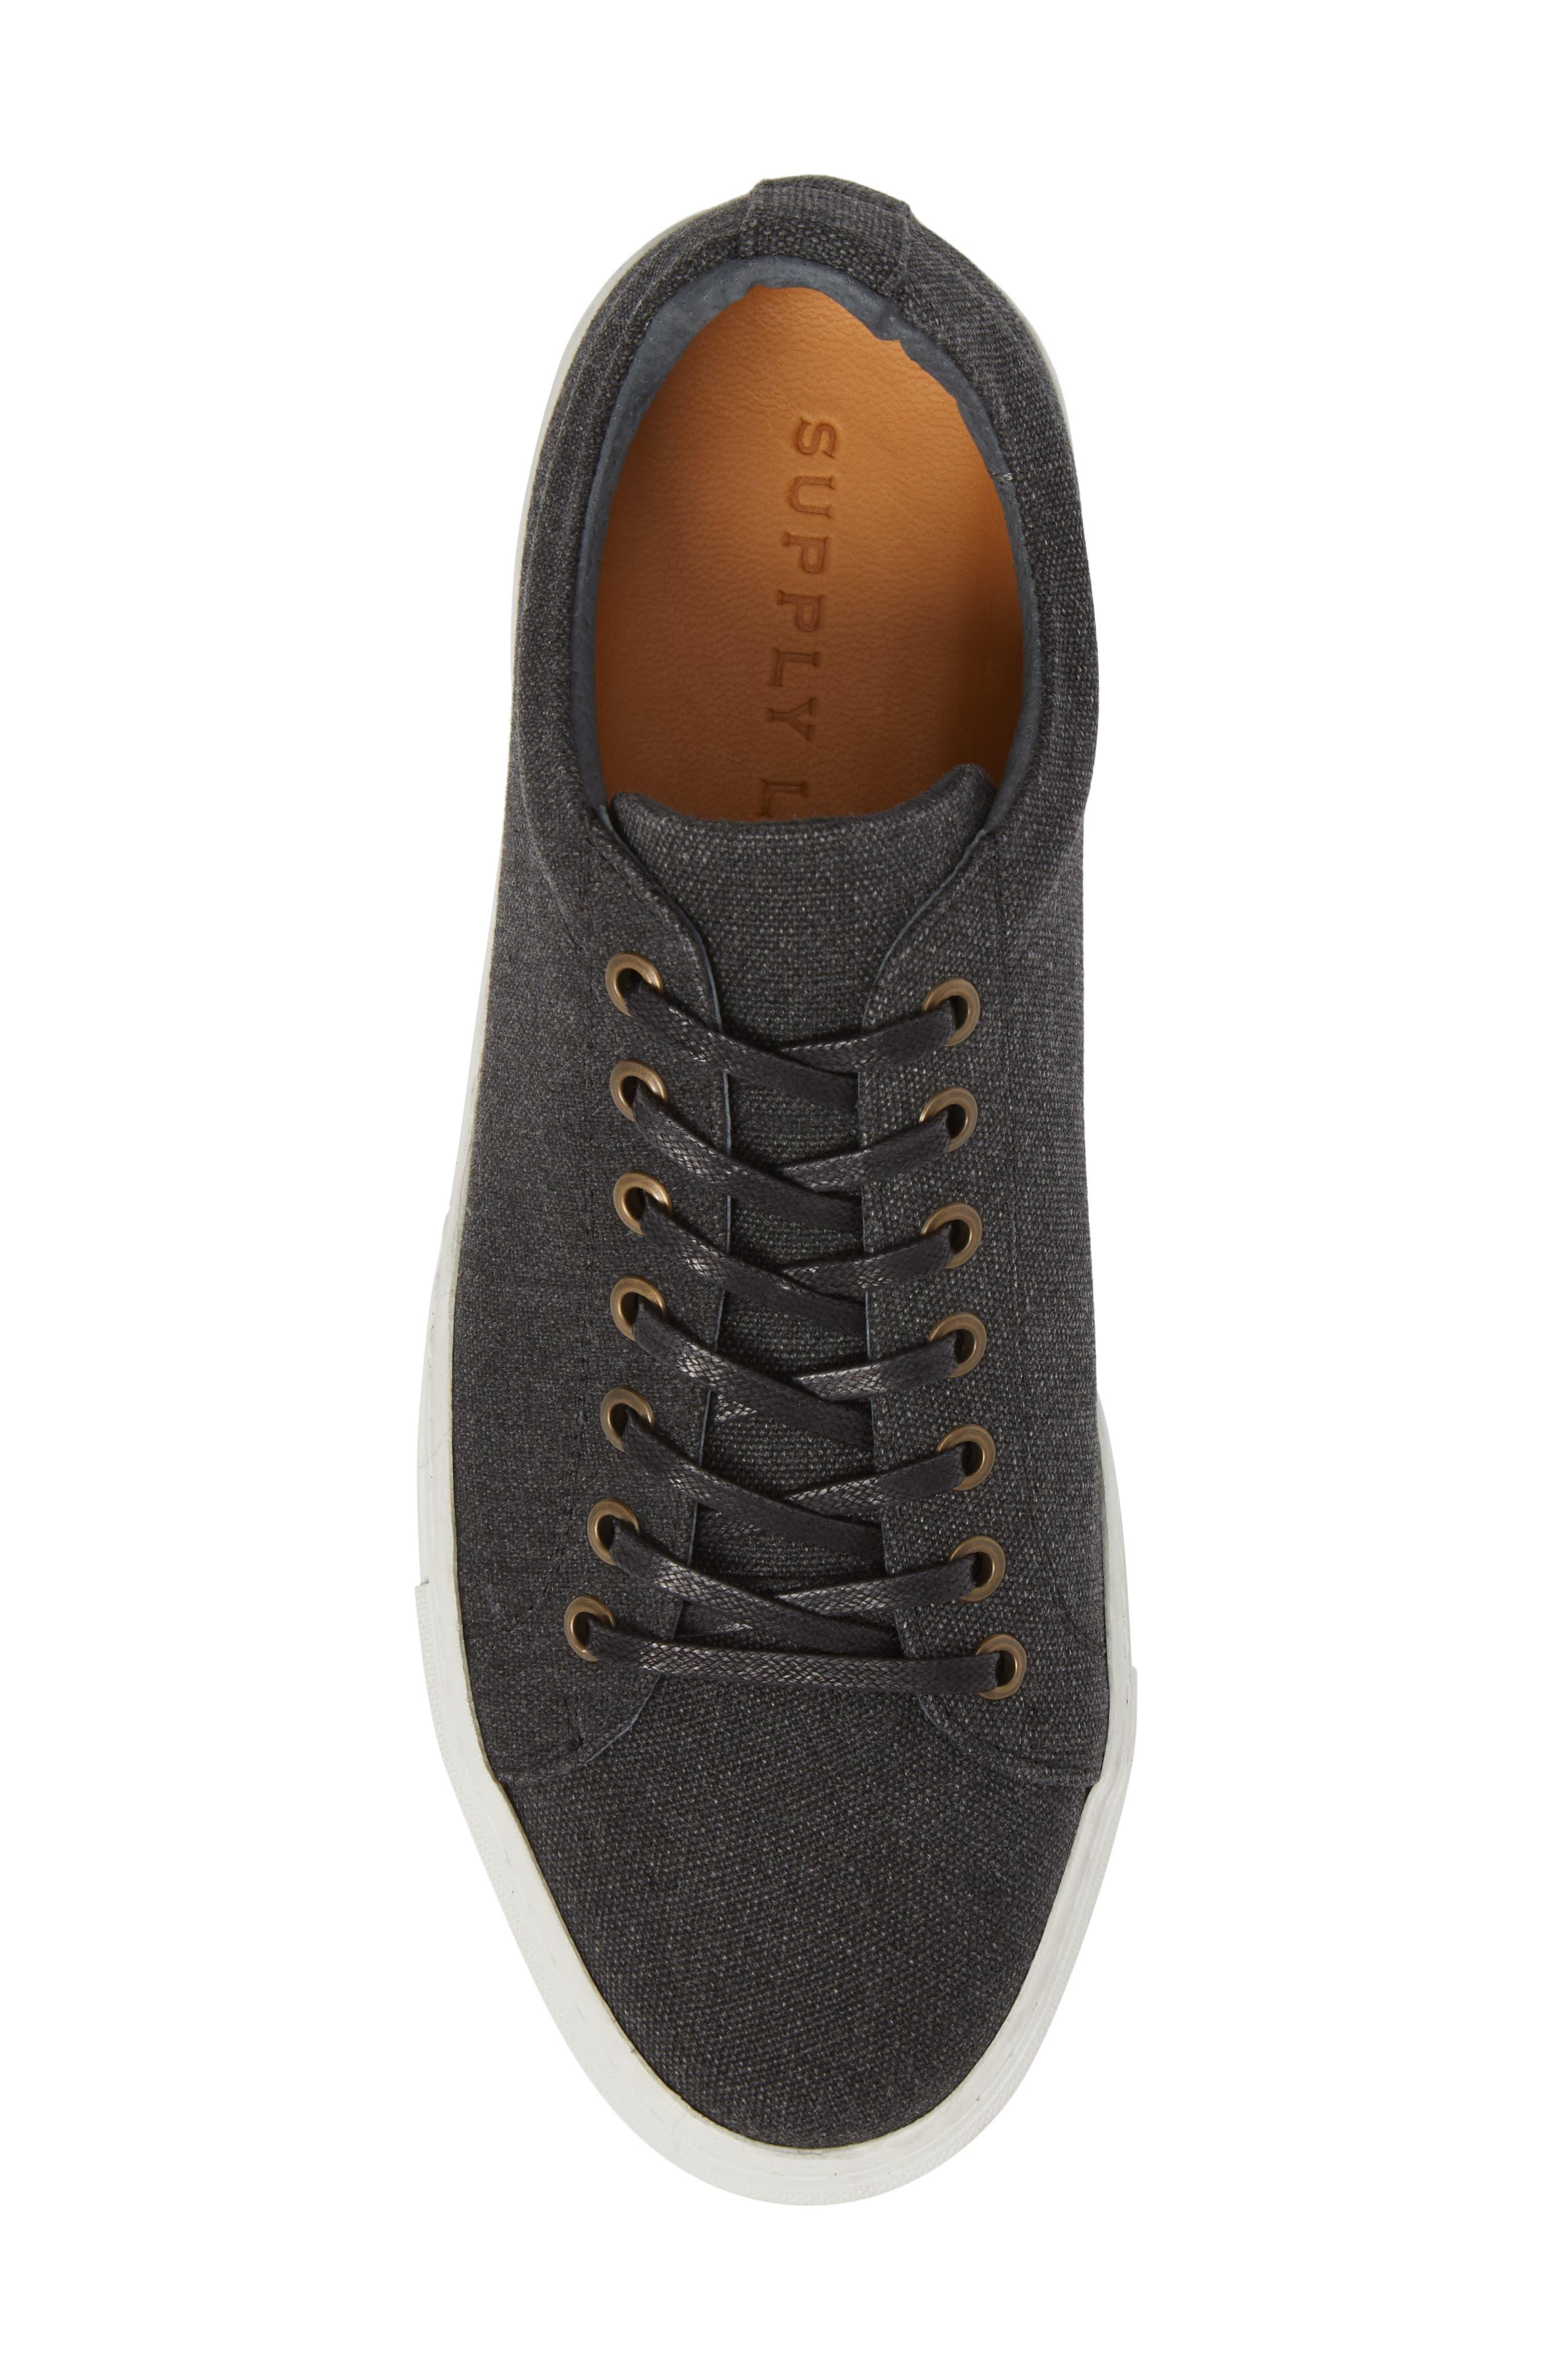 Mark Low Top Sneaker,                             Alternate thumbnail 5, color,                             007